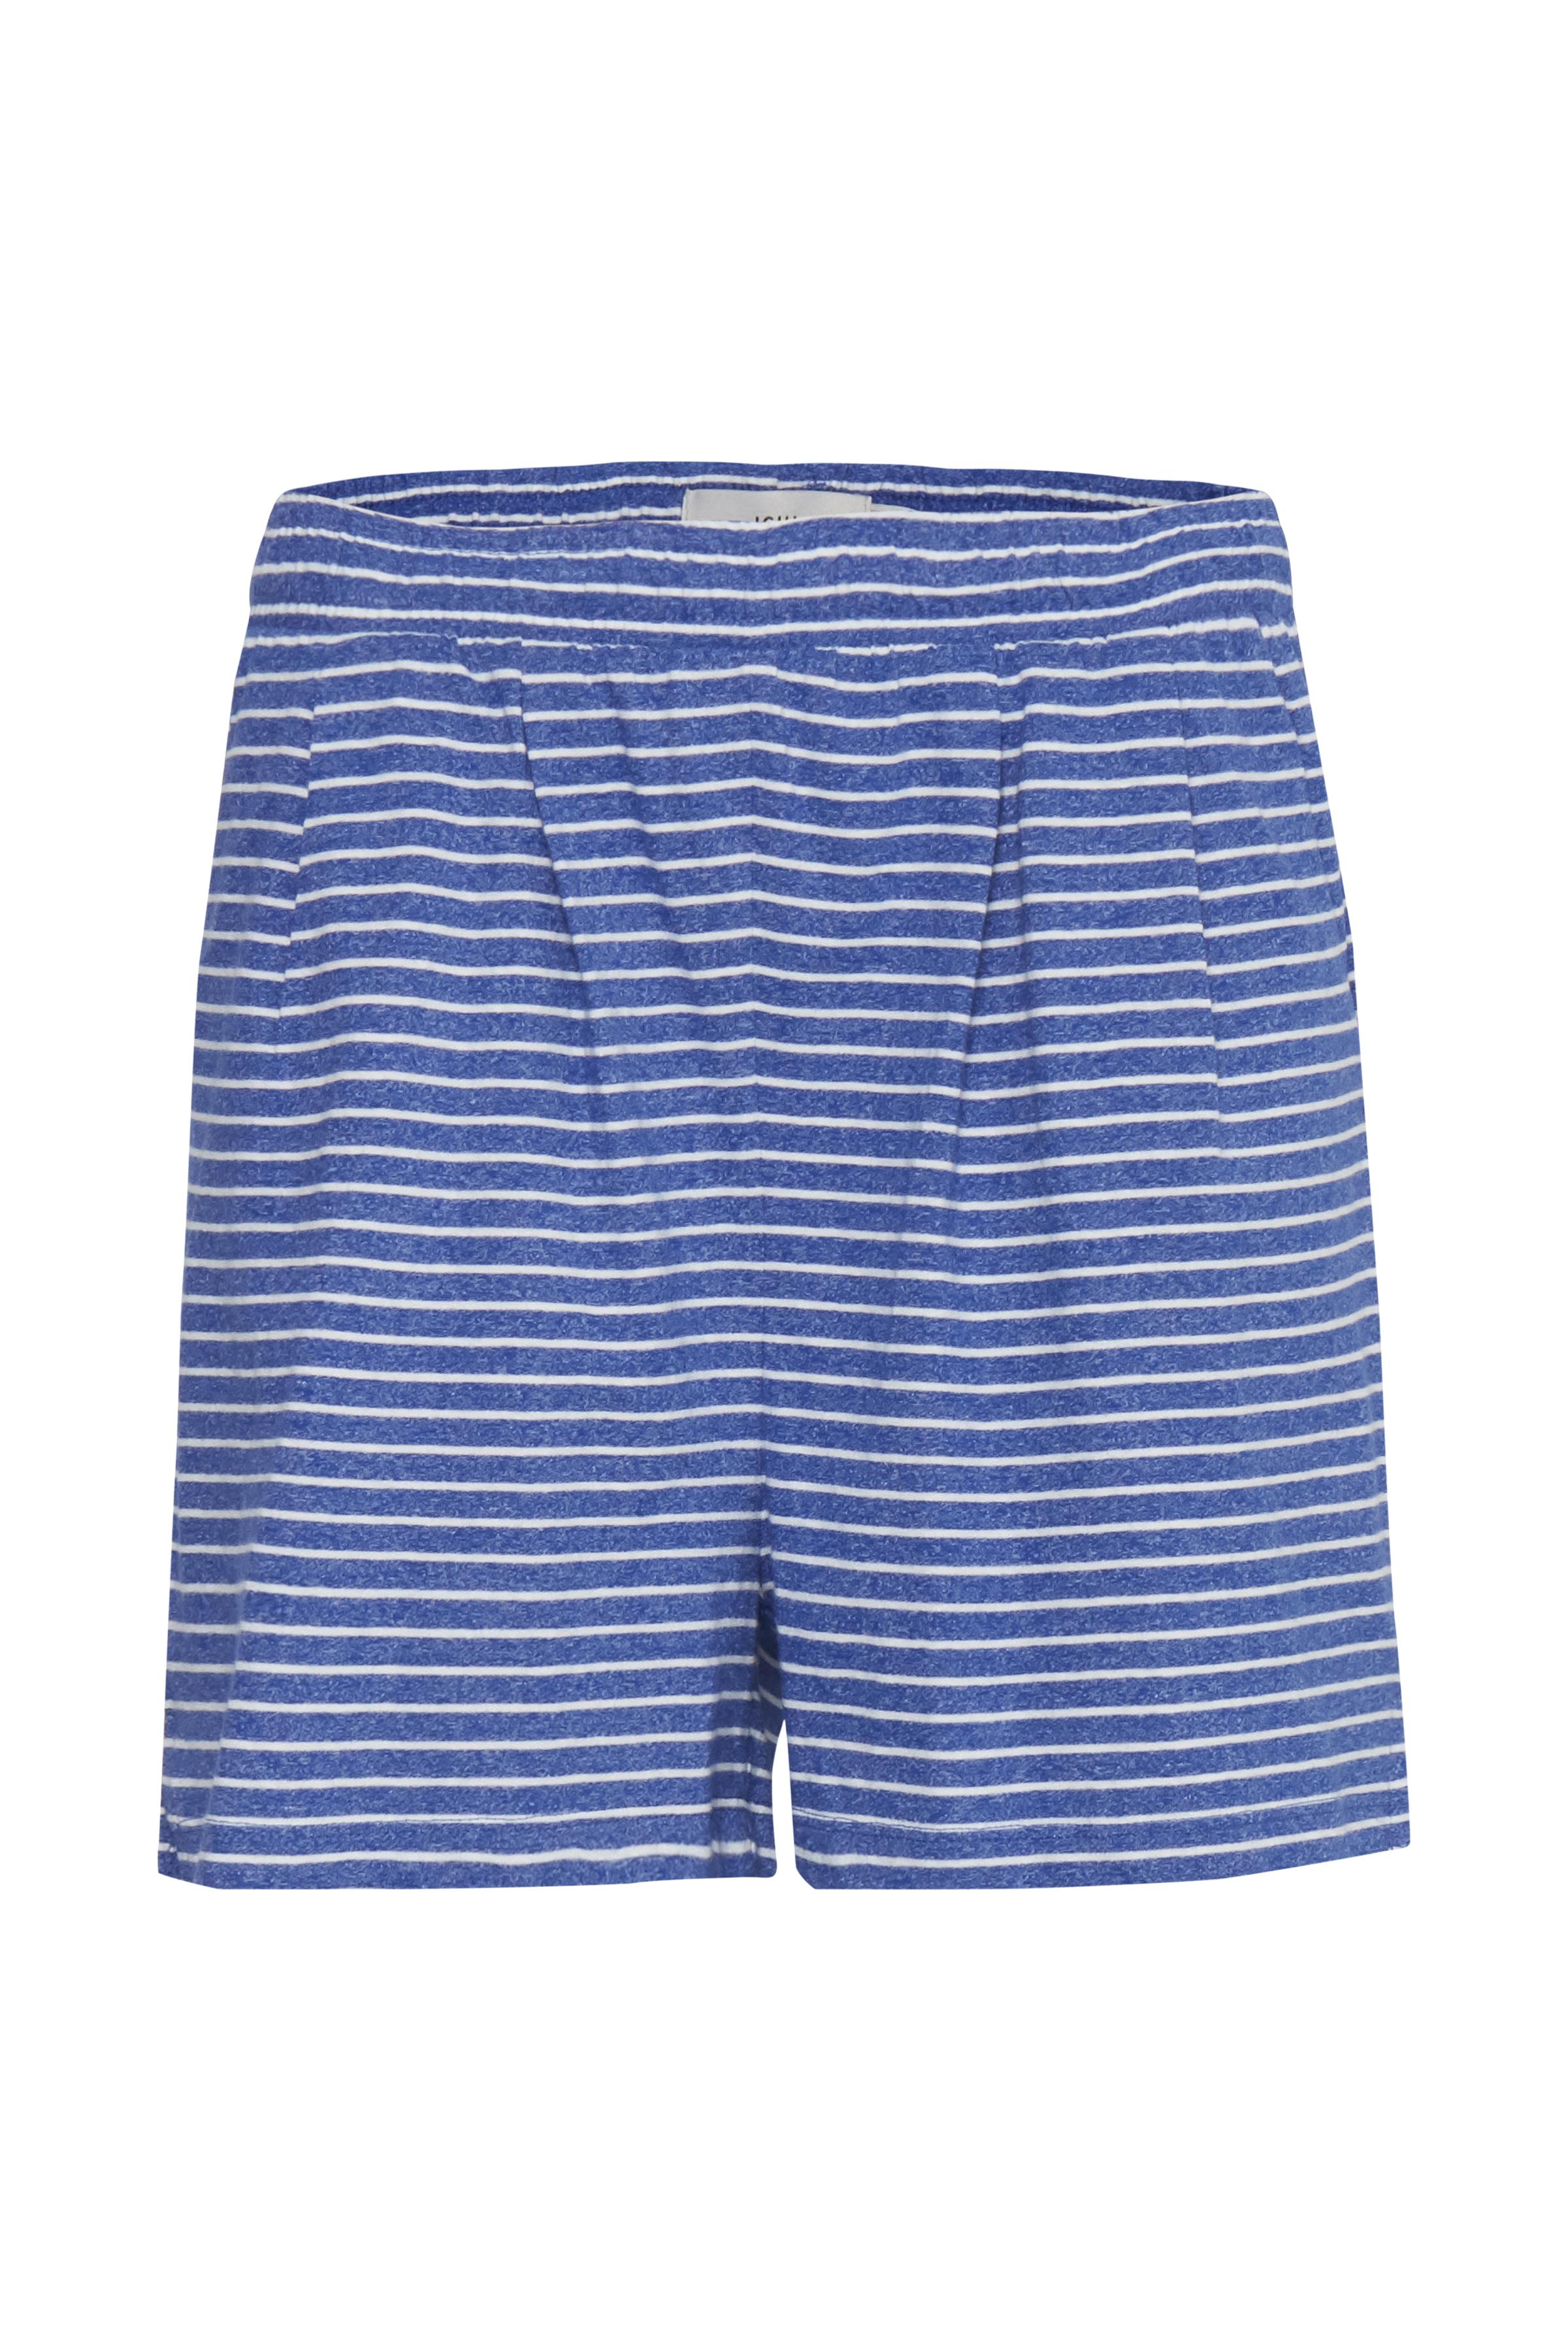 Small Stripe Mazarine Blue Shorts – Køb Small Stripe Mazarine Blue Shorts fra str. XS-XL her